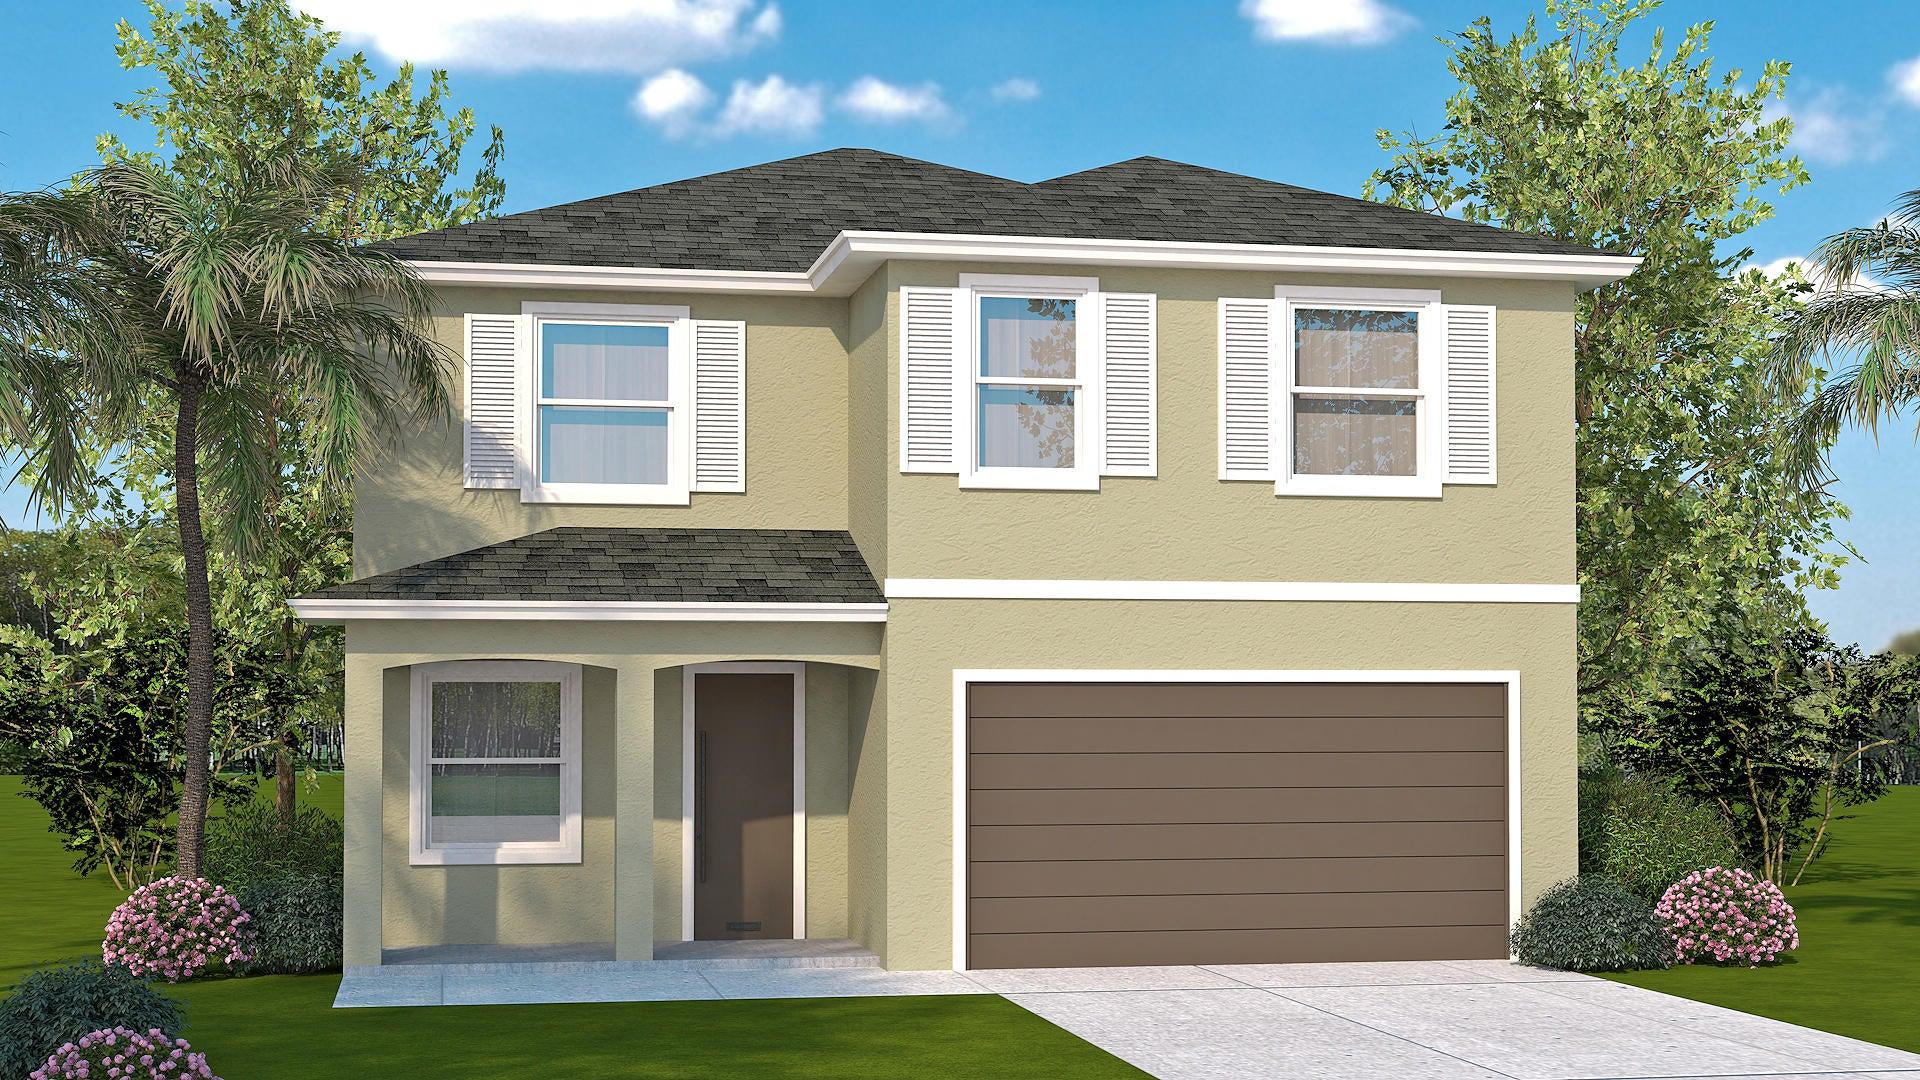 Single Family Home for Sale at 3914 La Rambla 3914 La Rambla Greenacres, Florida 33467 United States